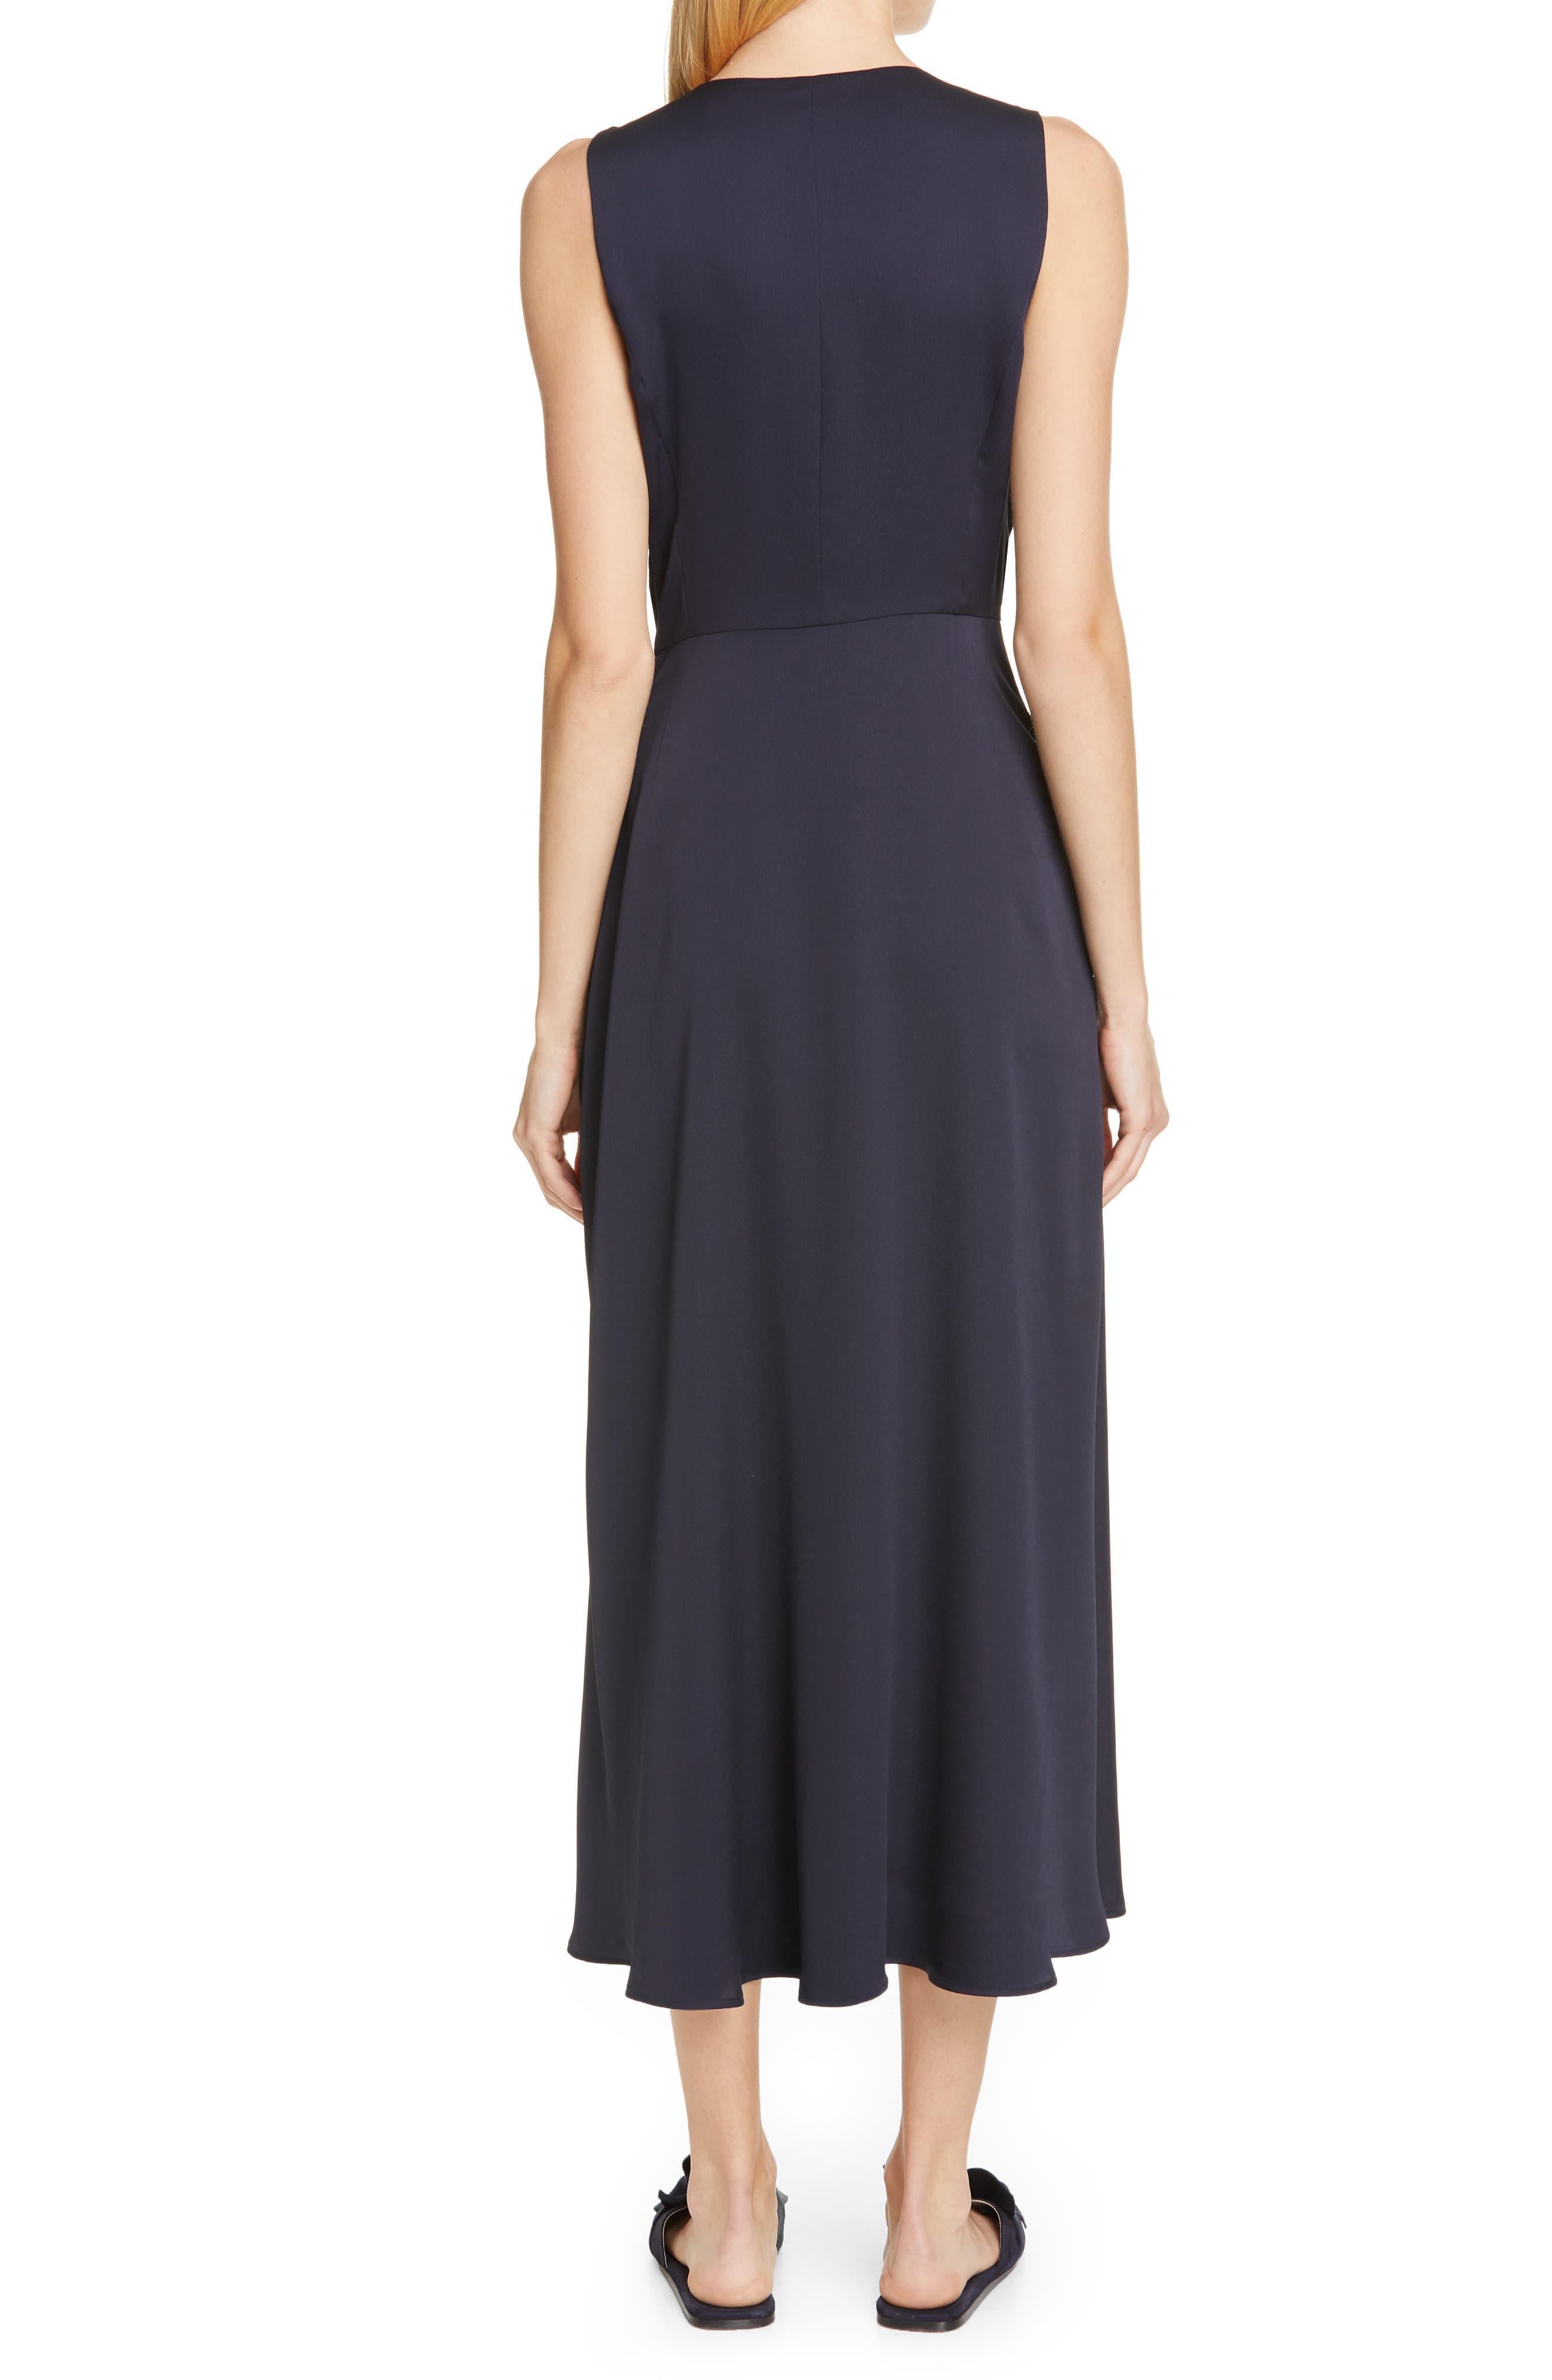 LAFAYETTE 148 NEW YORK, Ambrosia Tie Waist Midi Dress, Alternate thumbnail 2, color, INK